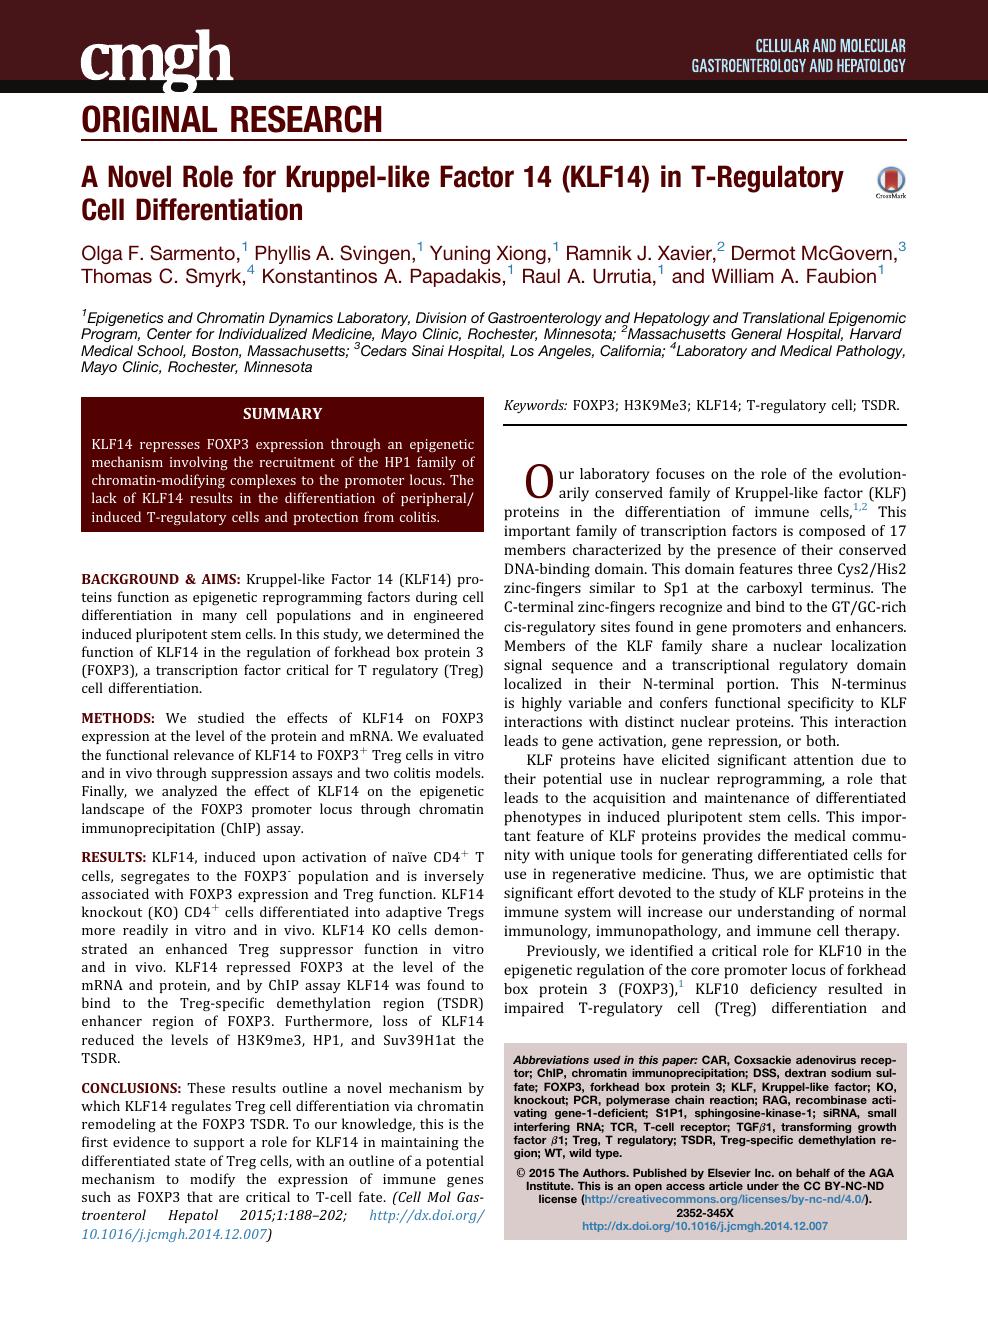 A Novel Role for Kruppel-like Factor 14 (KLF14) in T